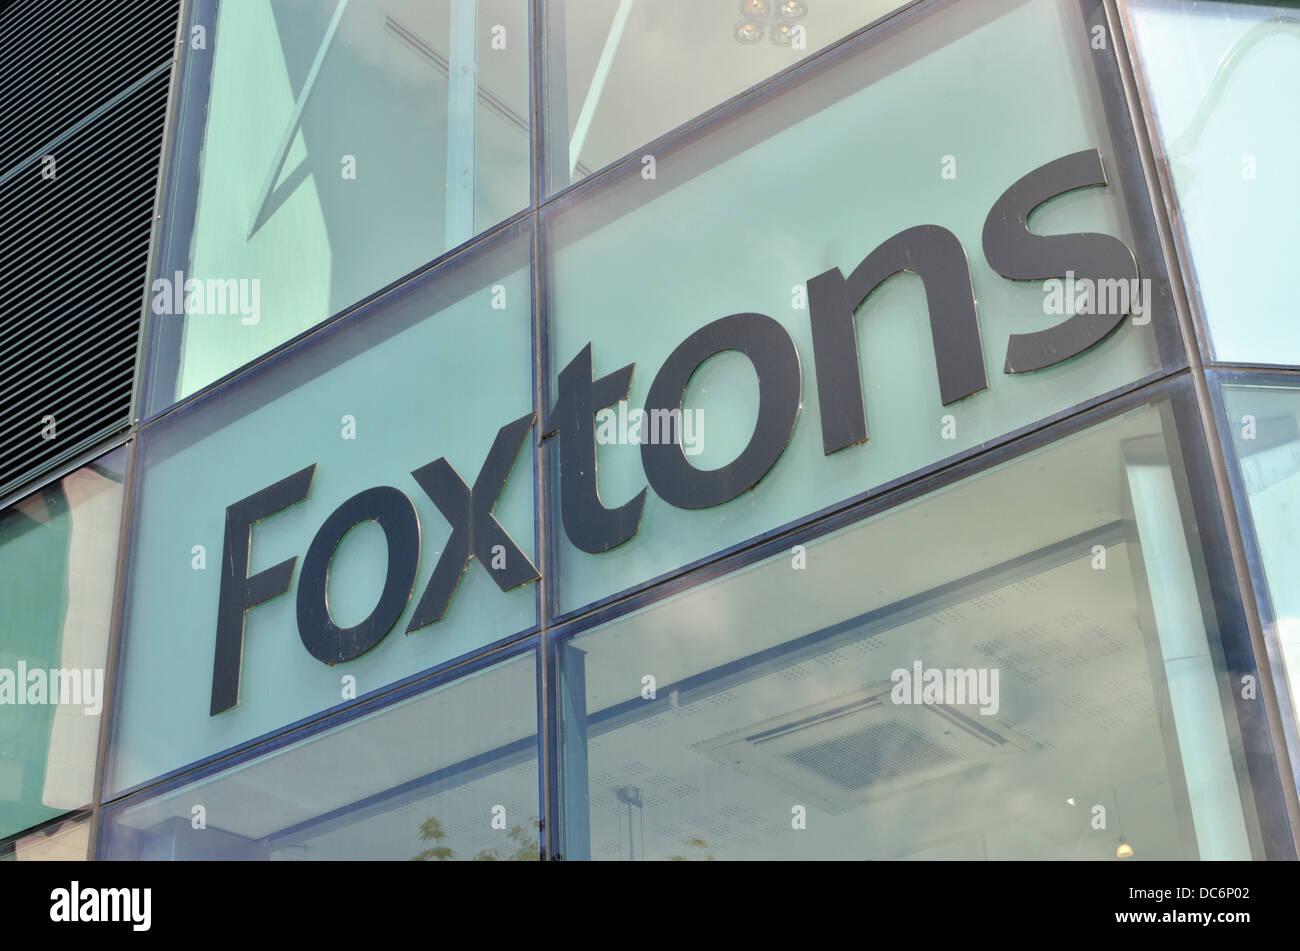 Foxtons estate agent sign, Camden Town, London, UK - Stock Image